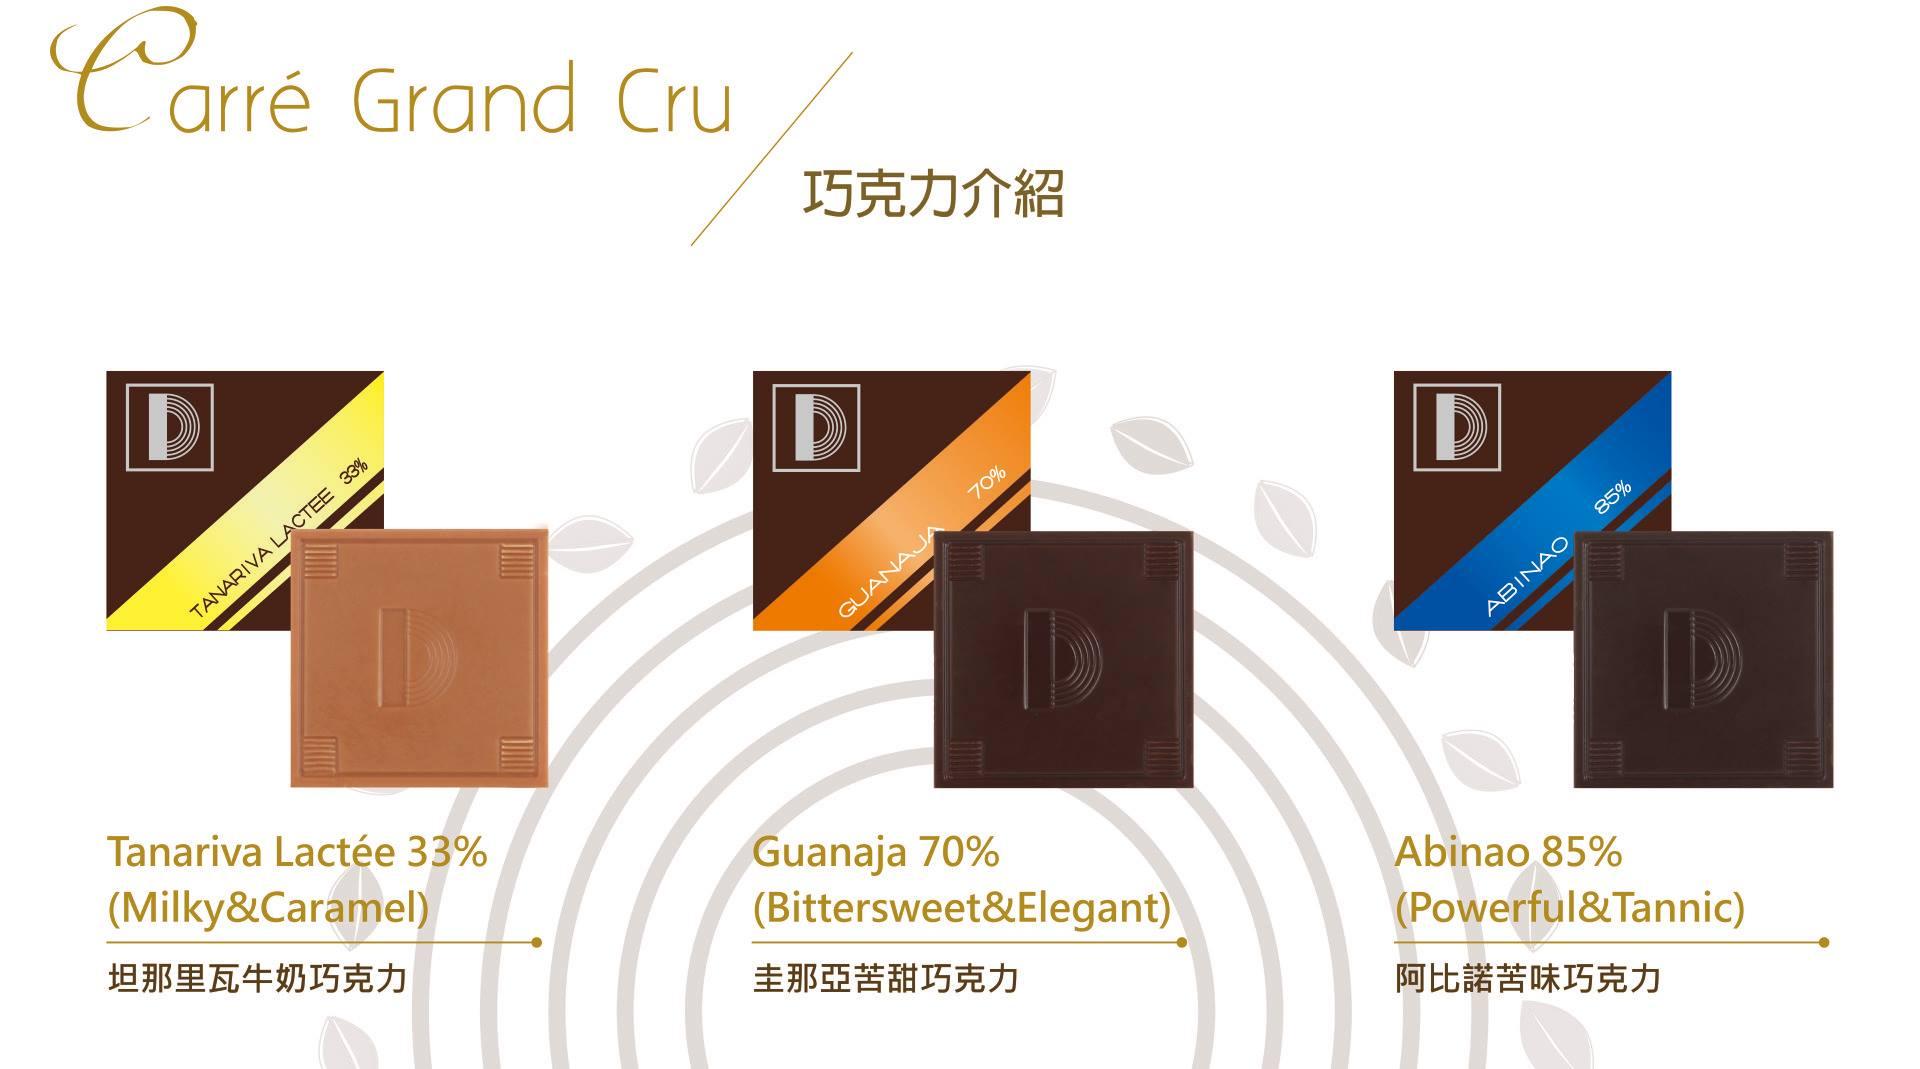 Carre Grand Cru 極品片狀巧克力 18片 3